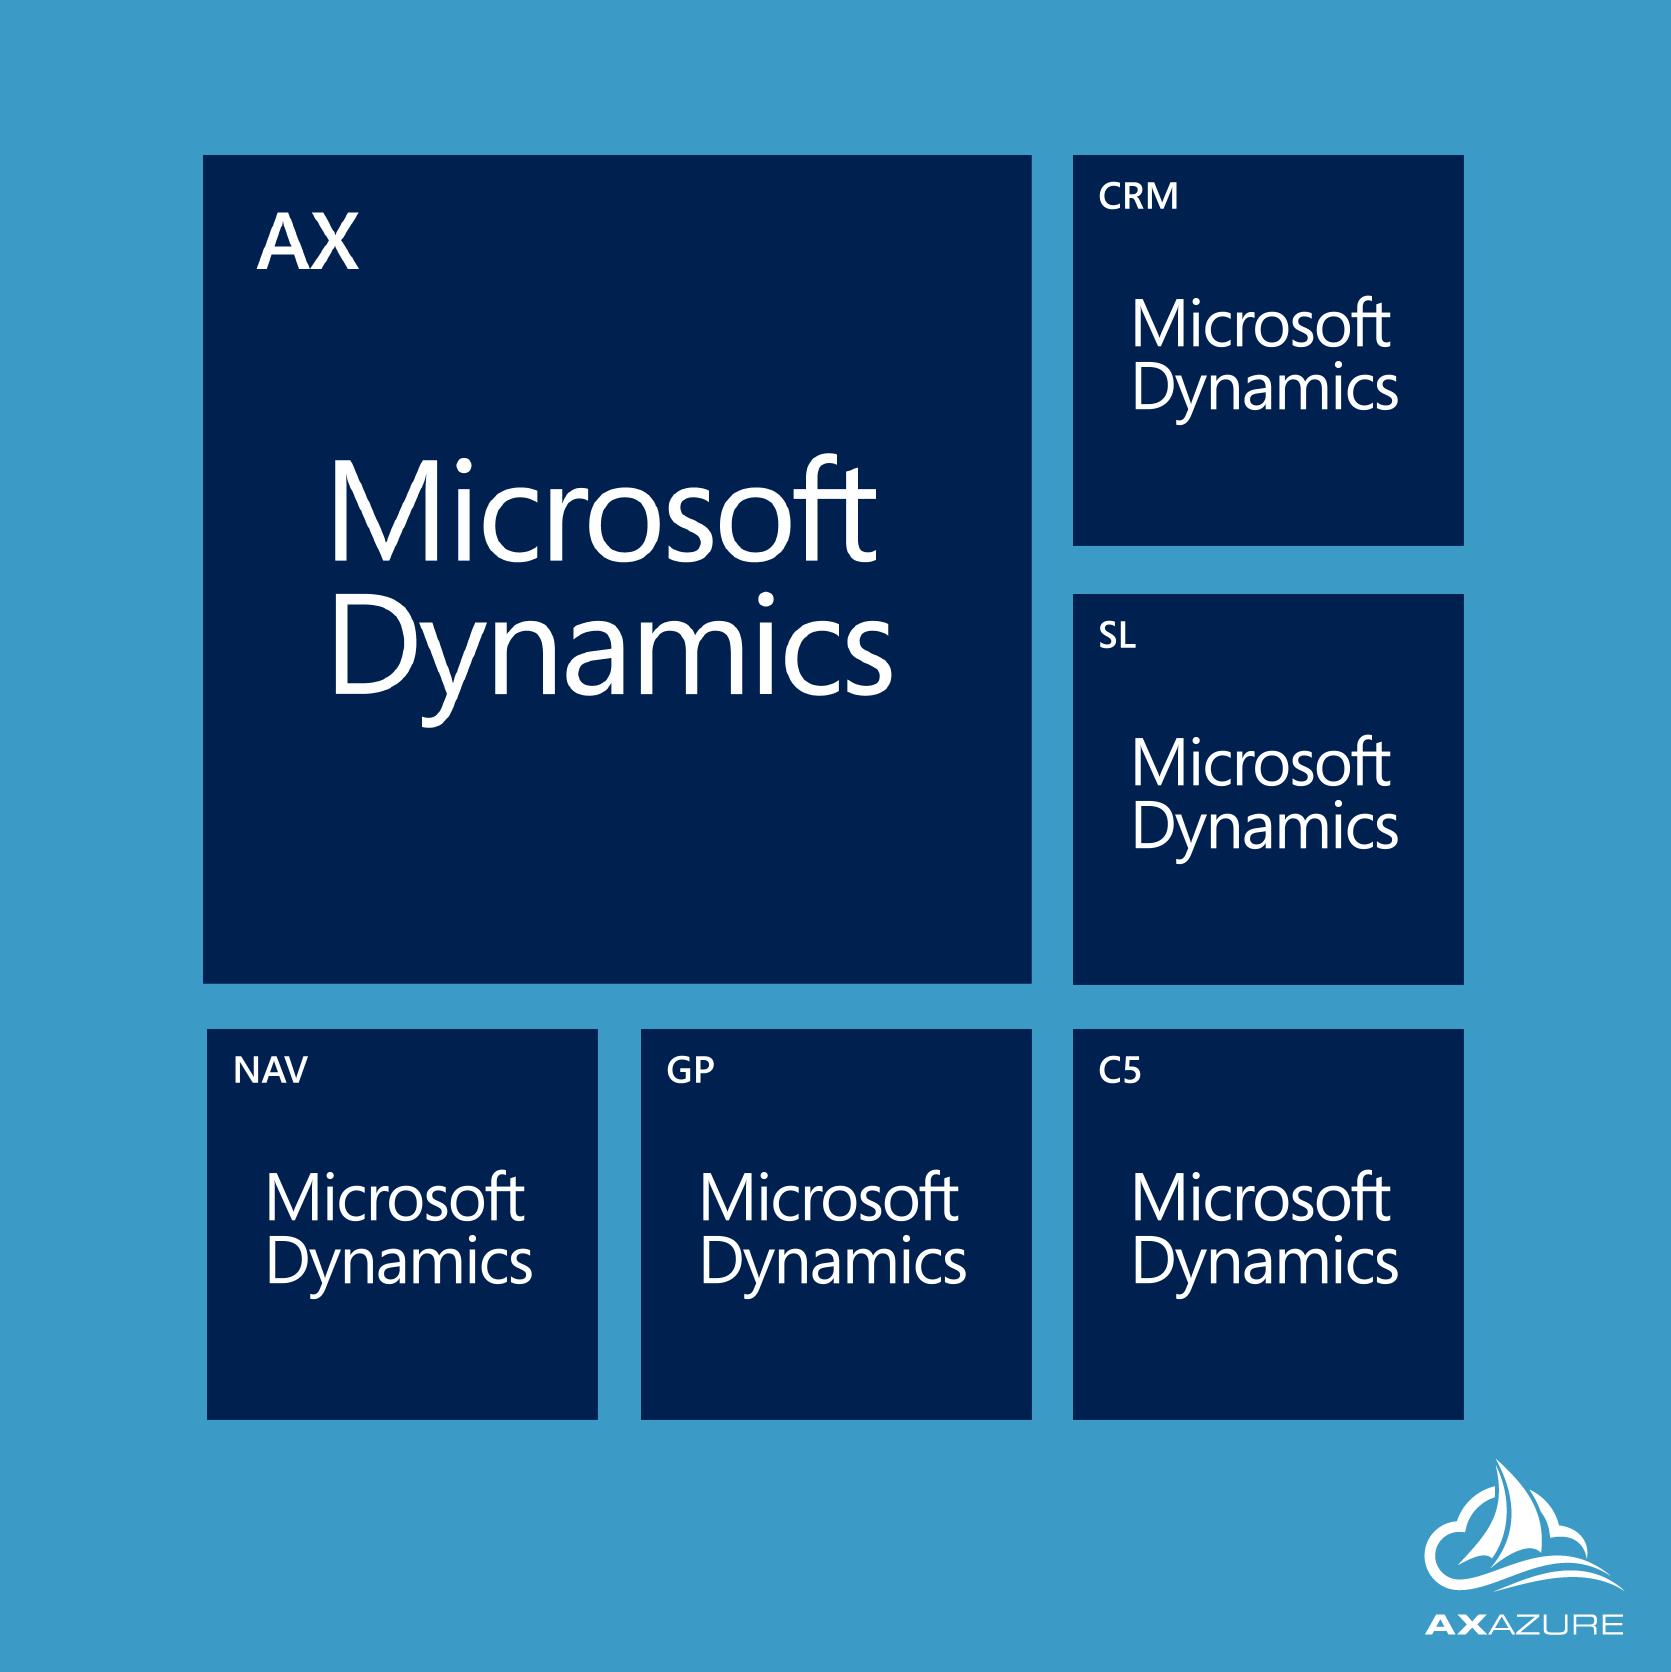 ¡Tormenta! Las velas de Microsoft Dynamics han volado